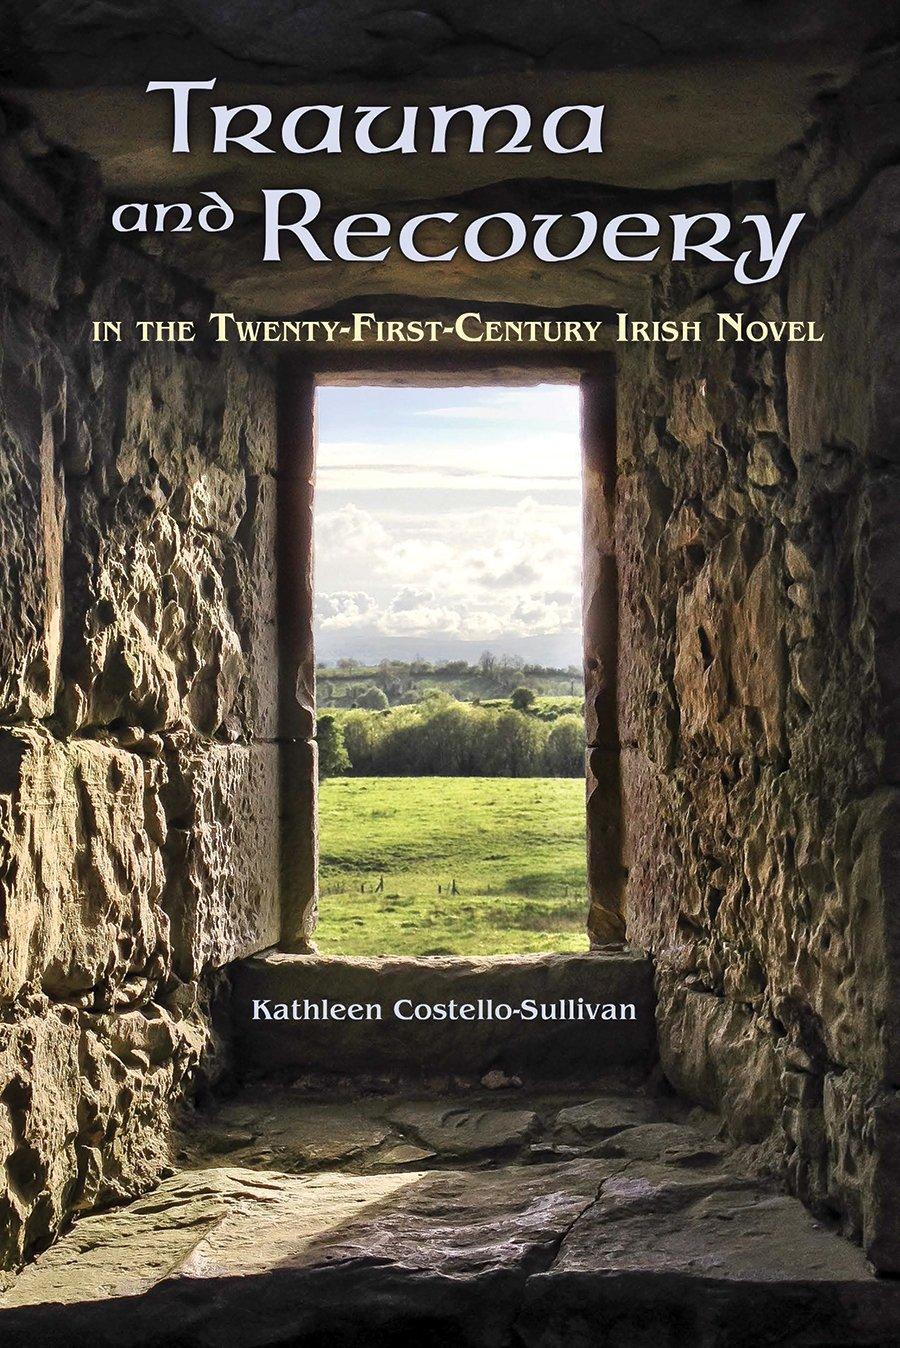 Download Trauma and Recovery in the Twenty-First-Century Irish Novel (Irish Studies) PDF